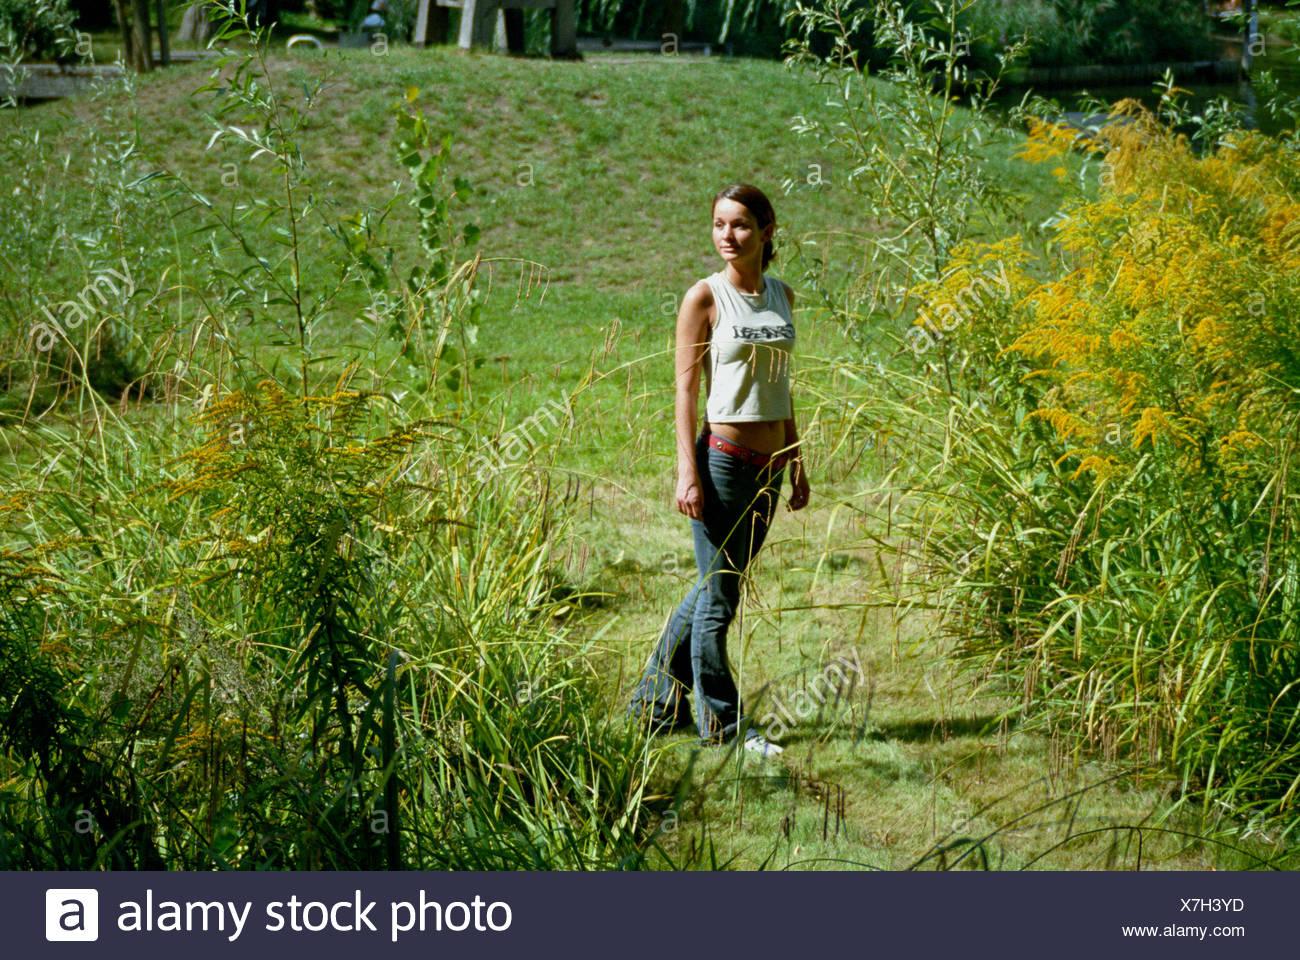 wait waiting park potsdam girlish arrive come meadow grass lawn green girl Stock Photo